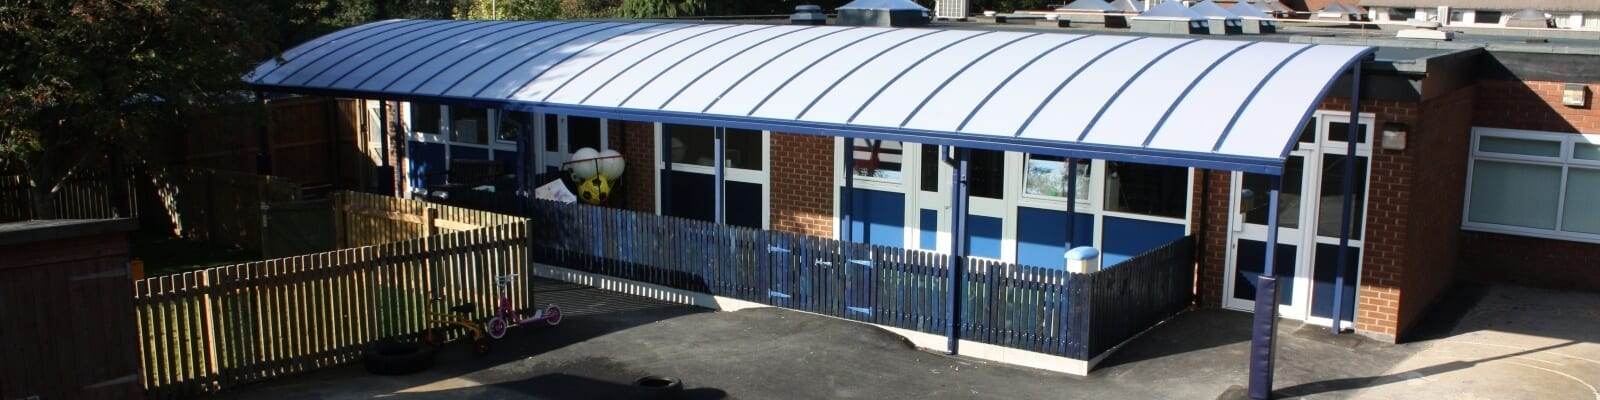 Playground shelter we made for Birkett House